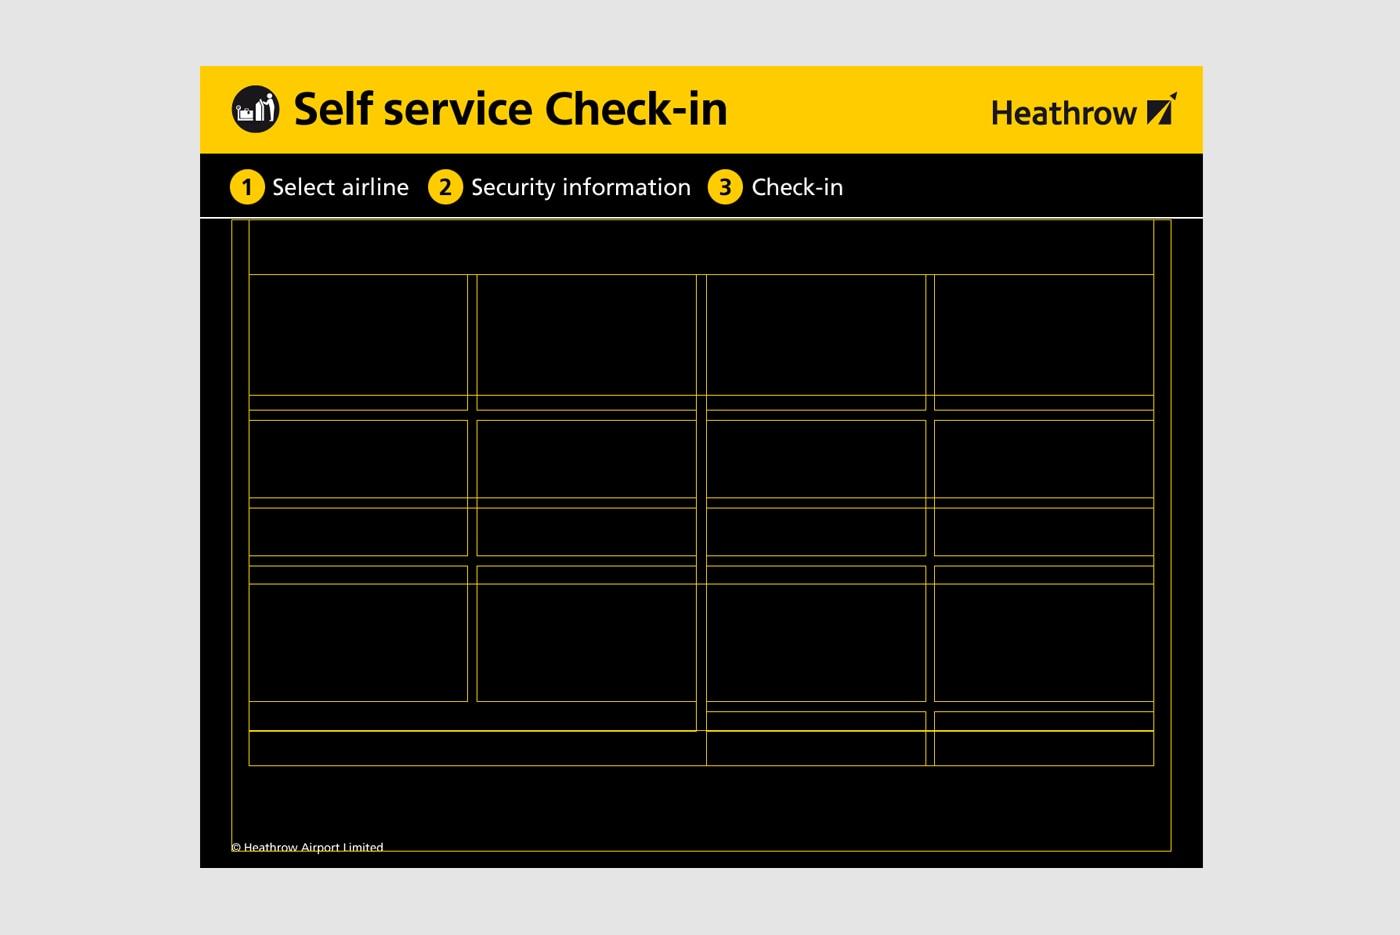 Heathrow's self service check-in